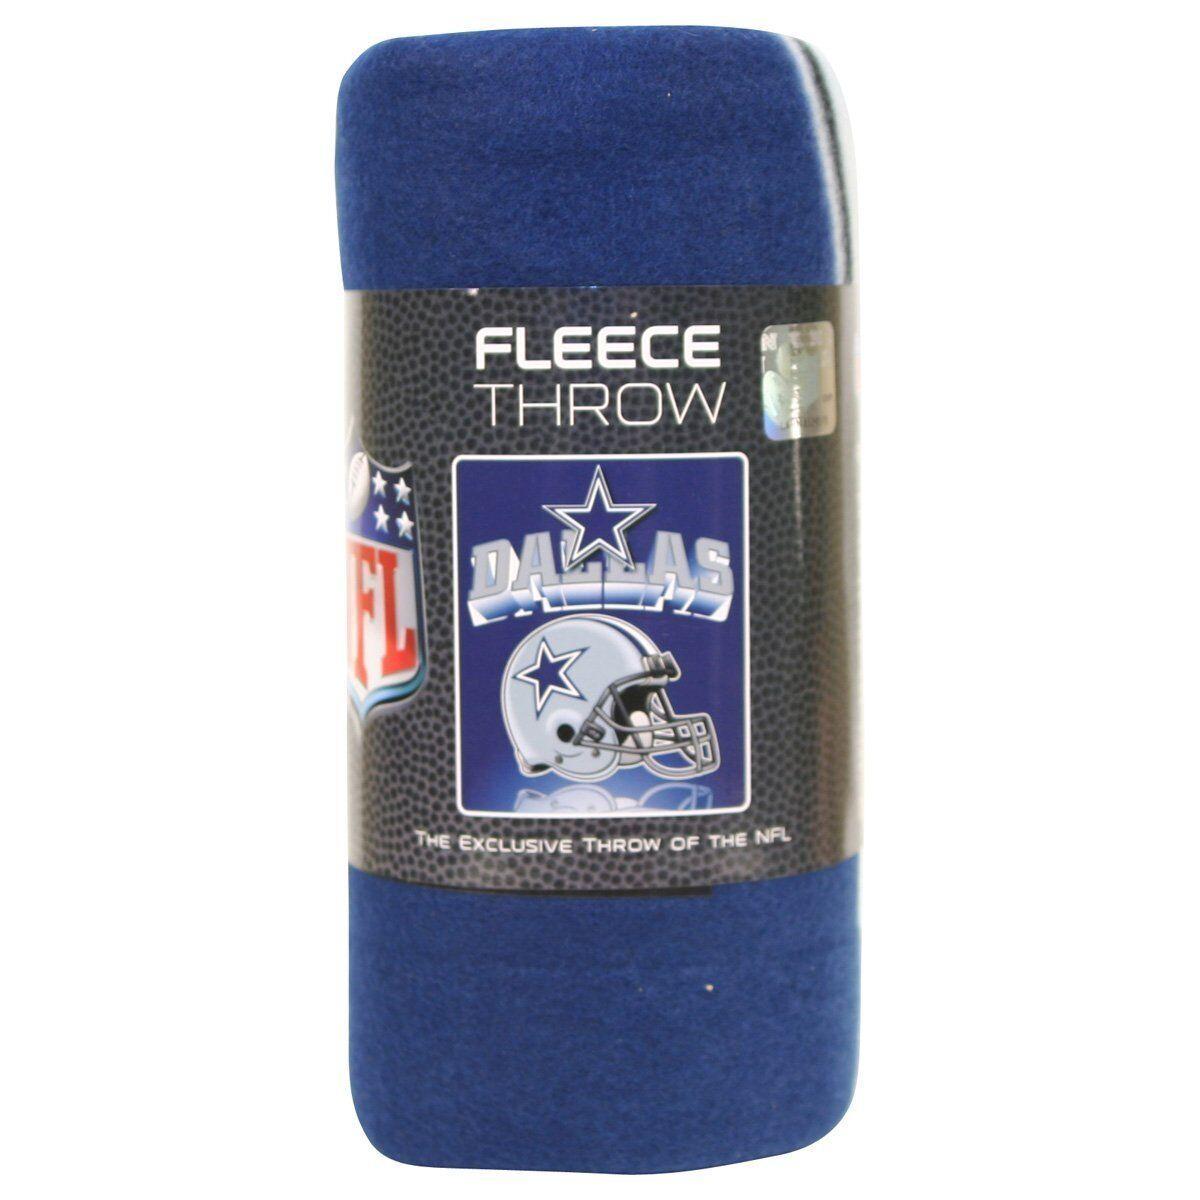 "NFL Teams Soft Fleece Throw Blanket 50"" X 60"" - Pick Your Team"